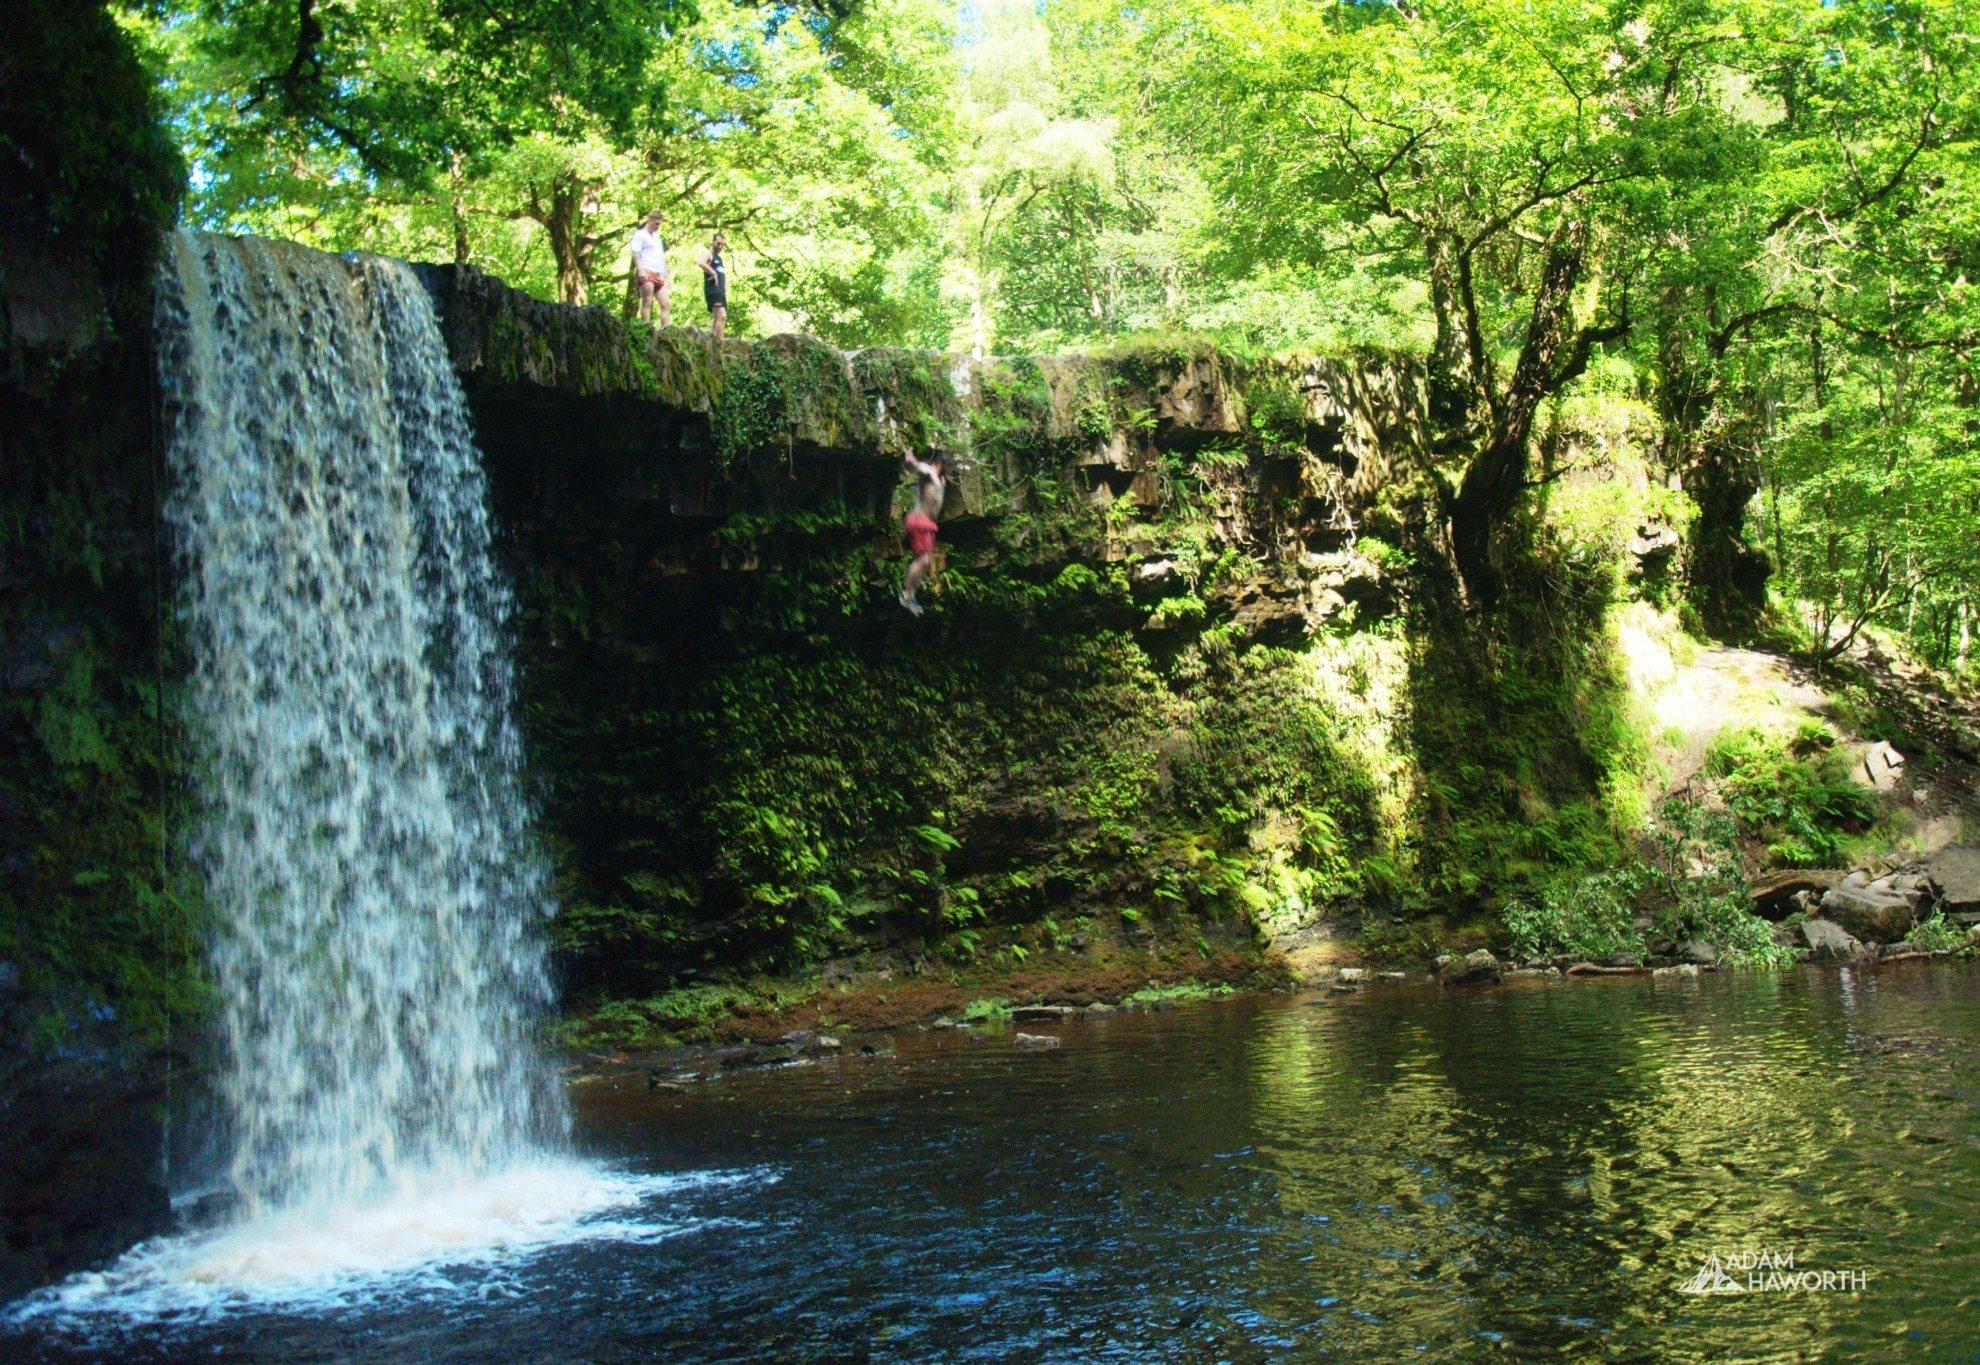 Brecon Beacons Waterfall Country – Adam Haworth